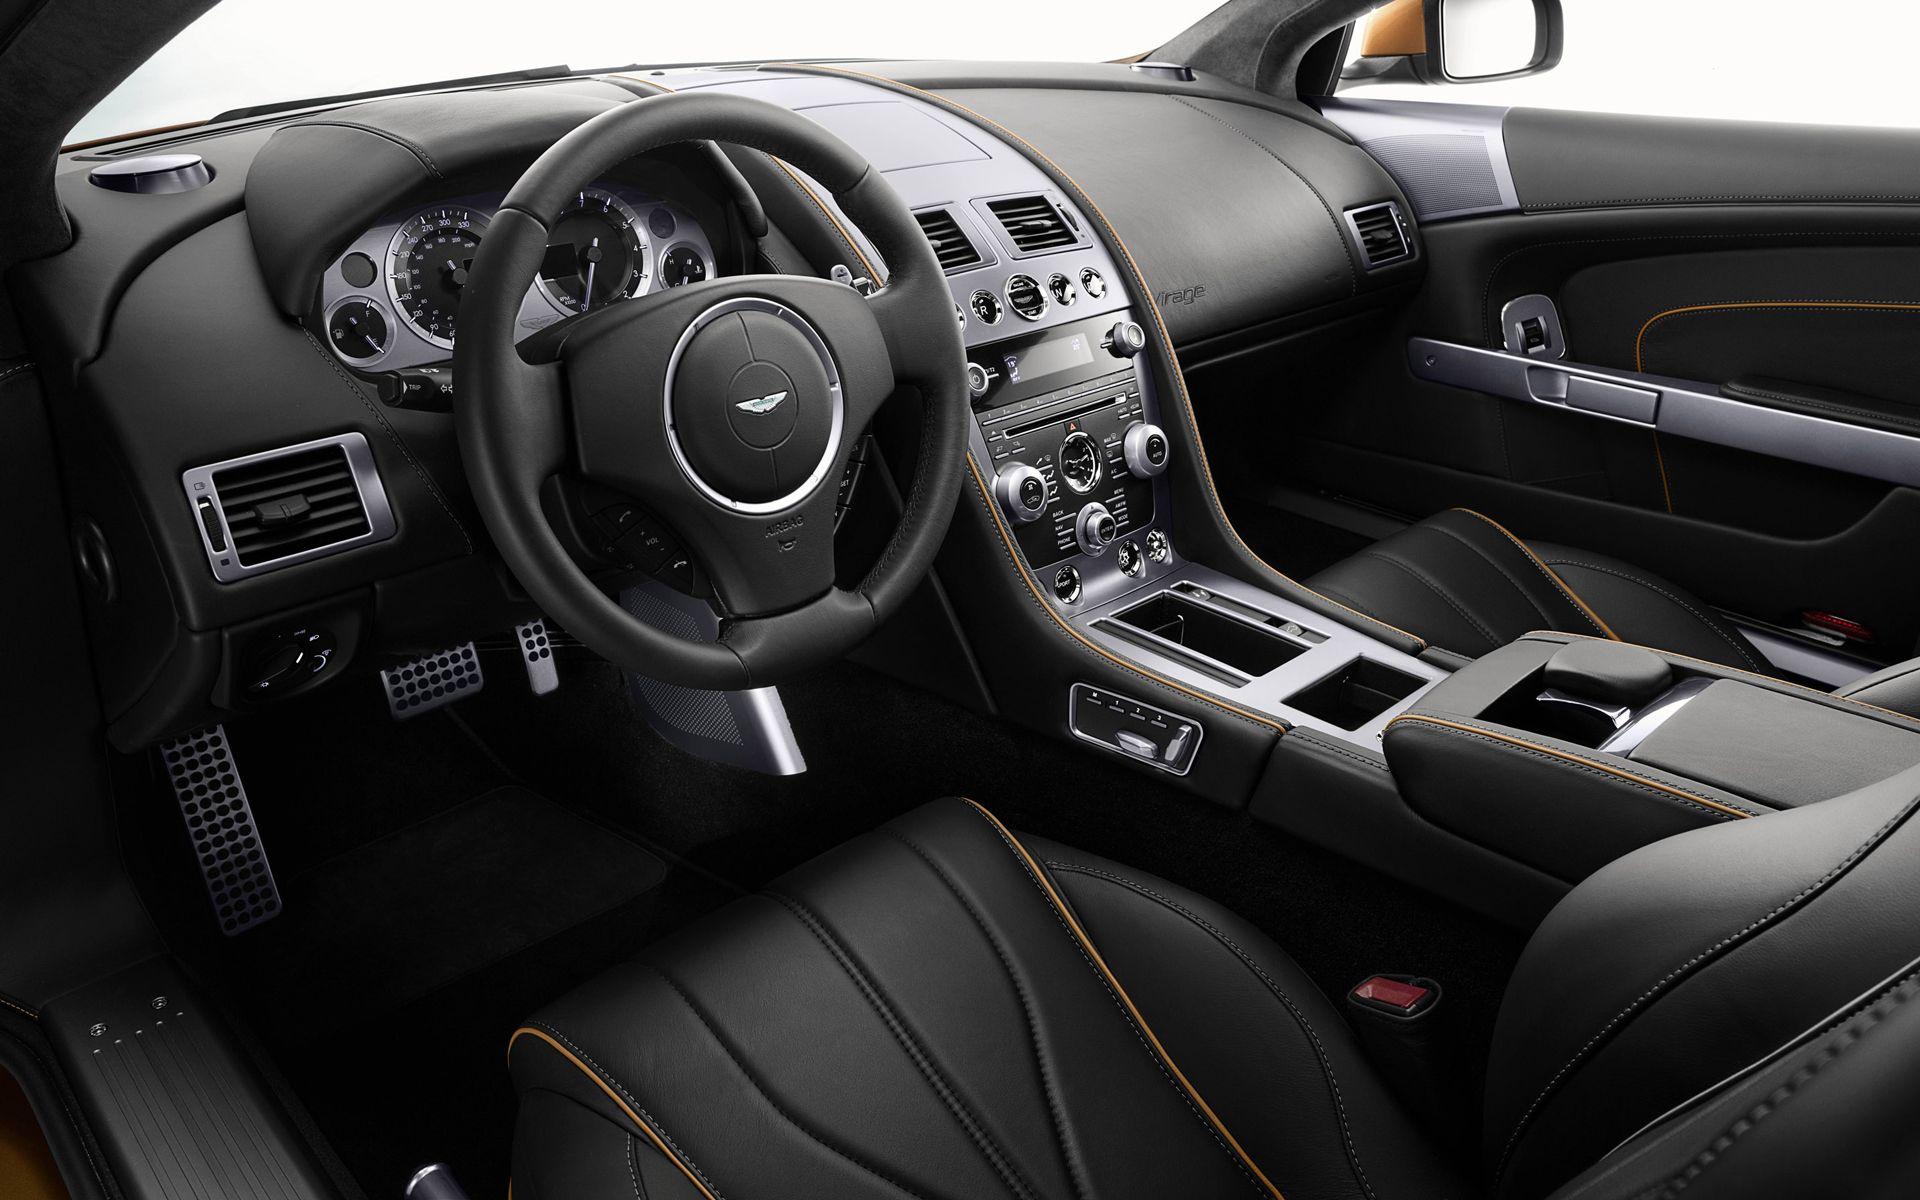 Aston Martin V12 Zagato black leather interior